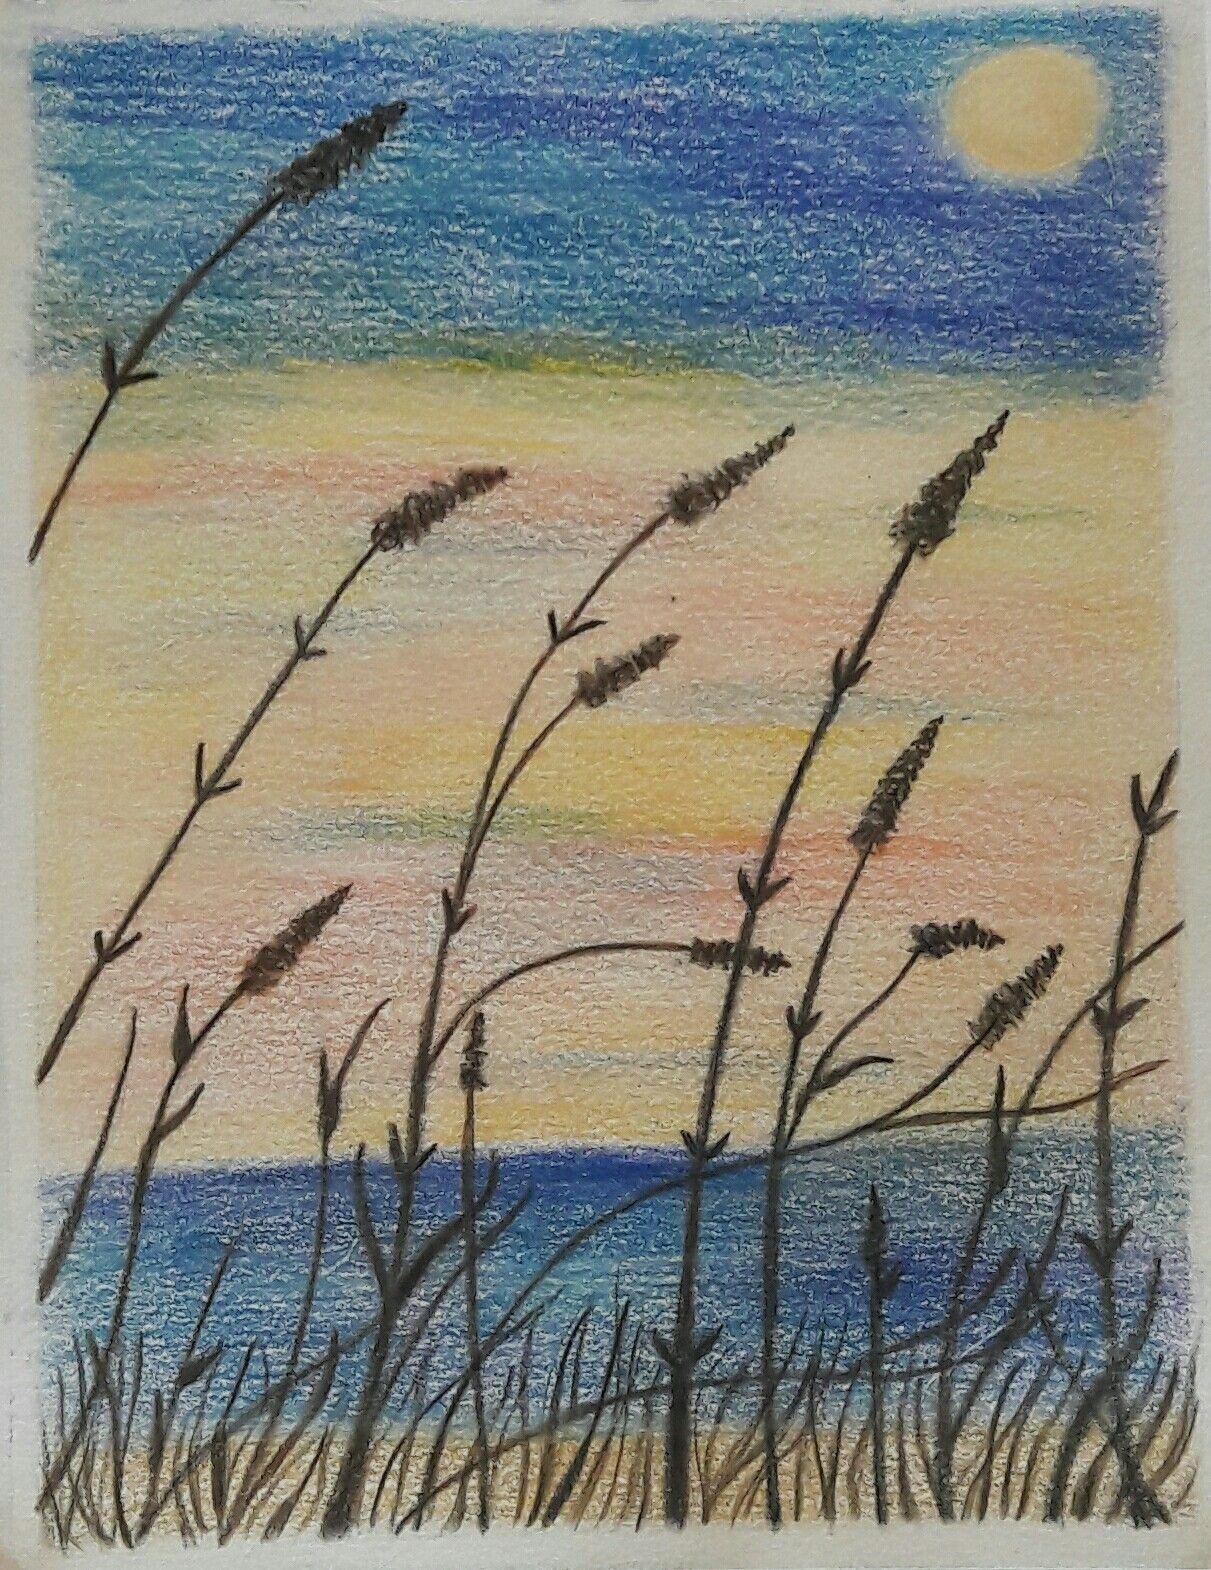 Seaside sunset colored pencils sketch